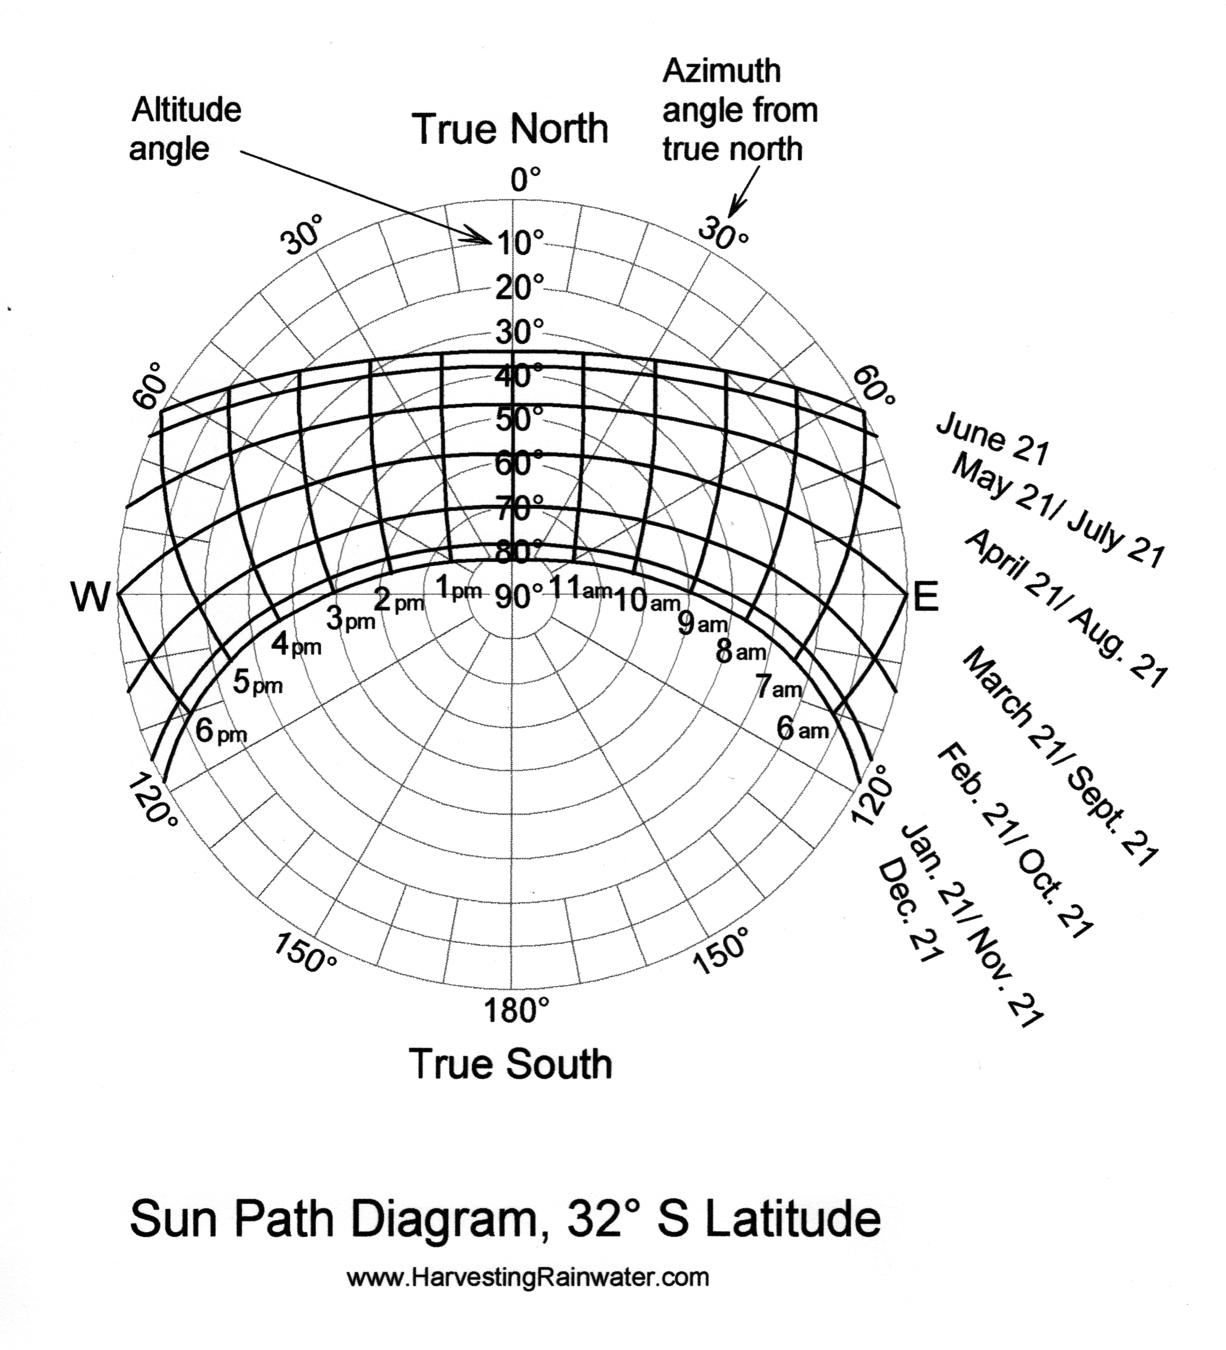 Sun Path Diagram 32o S Latitude